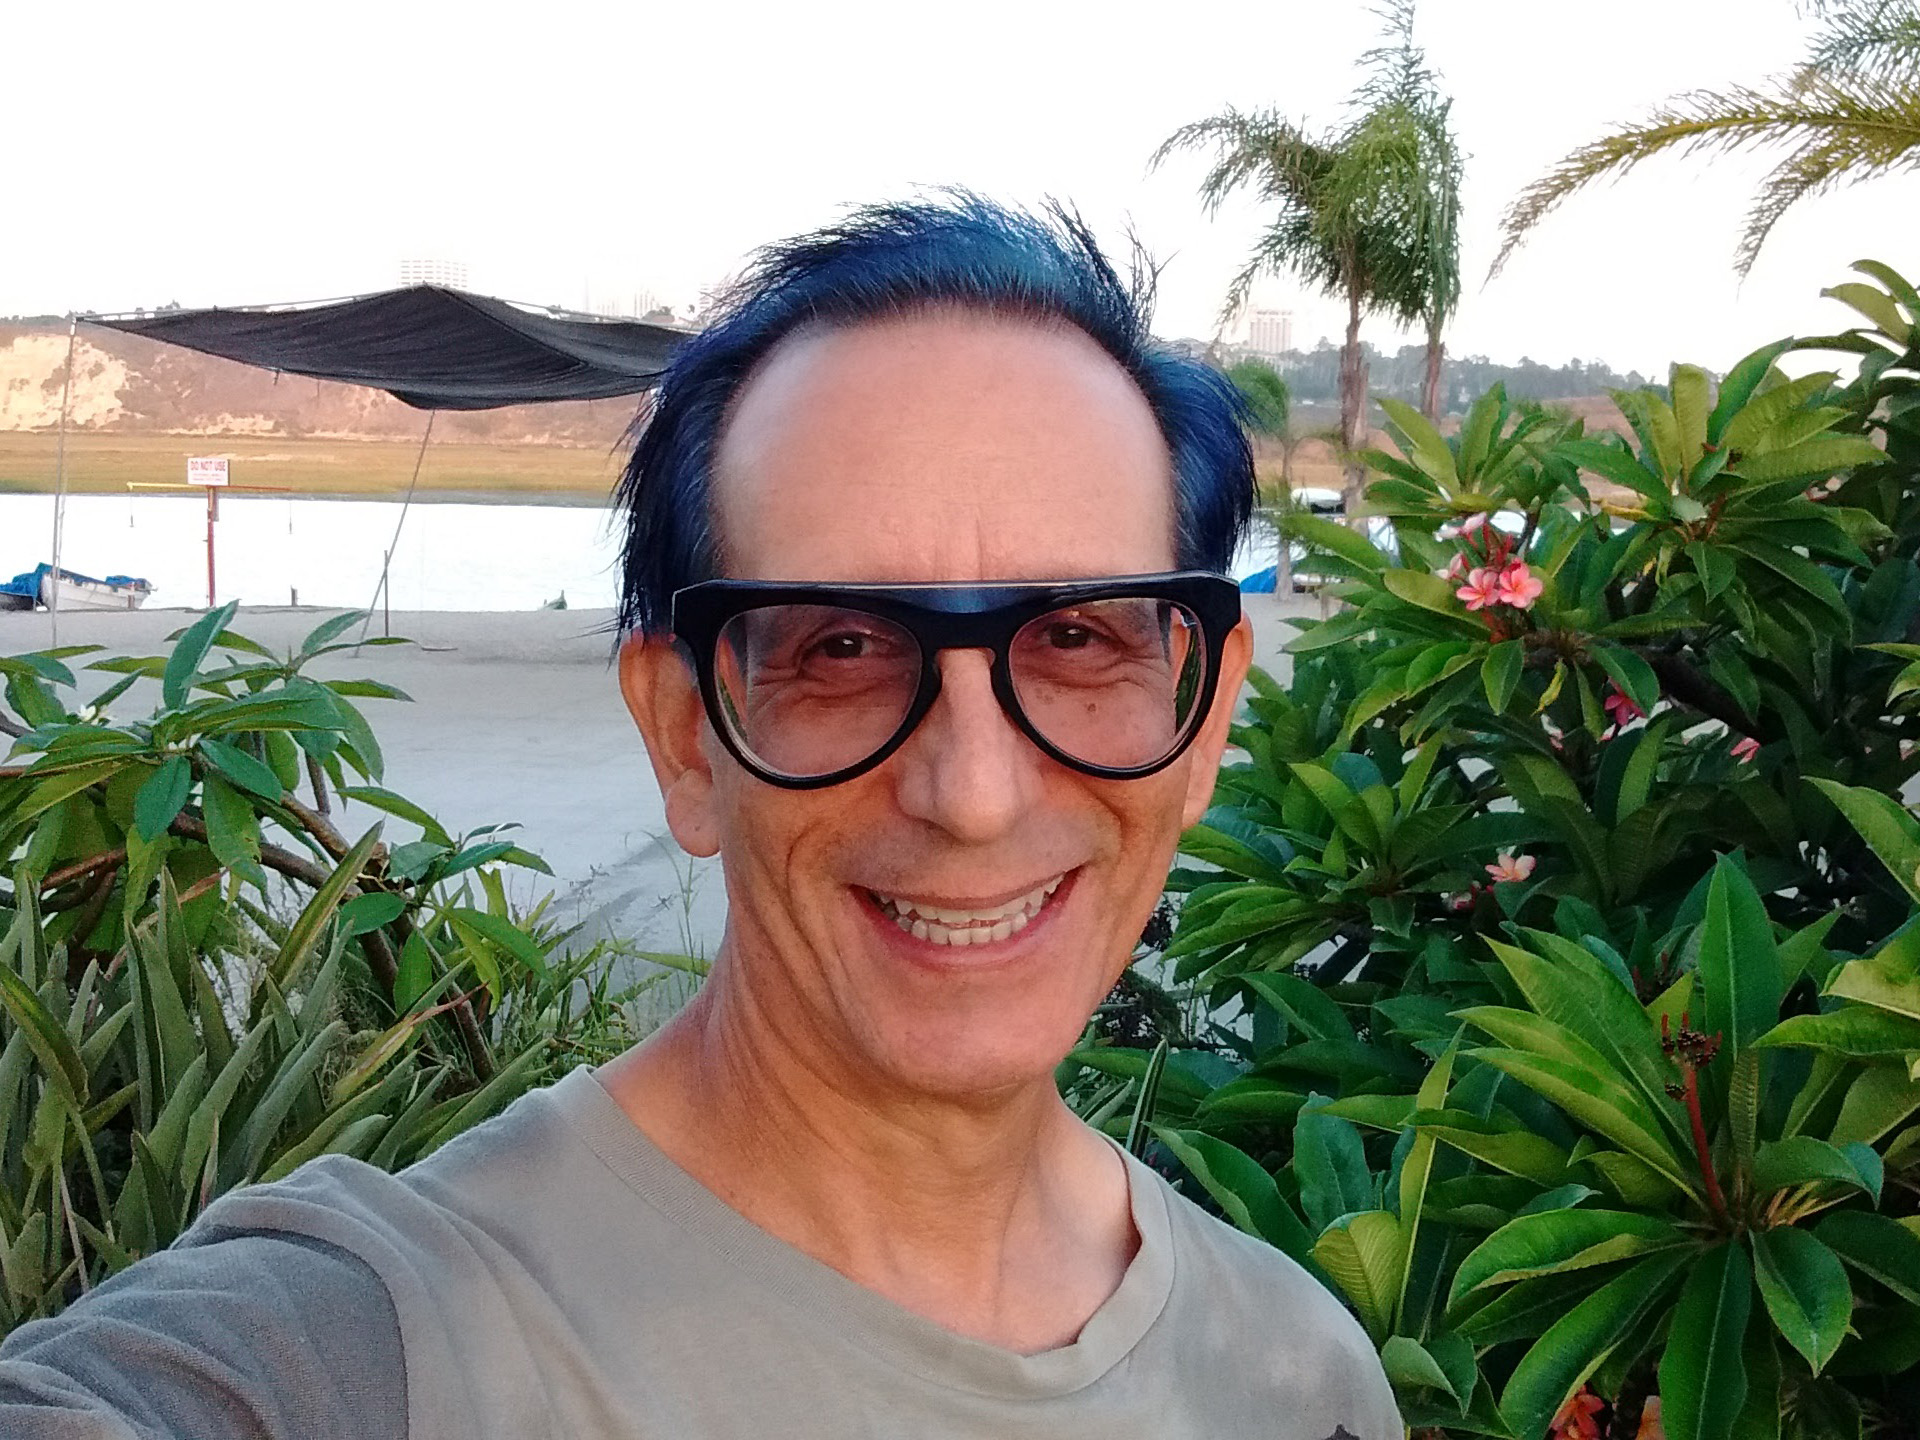 Glenn Zucman wearing SEE Mondo Randy frames at the Newport Aquatic Center in Newport Beach, California